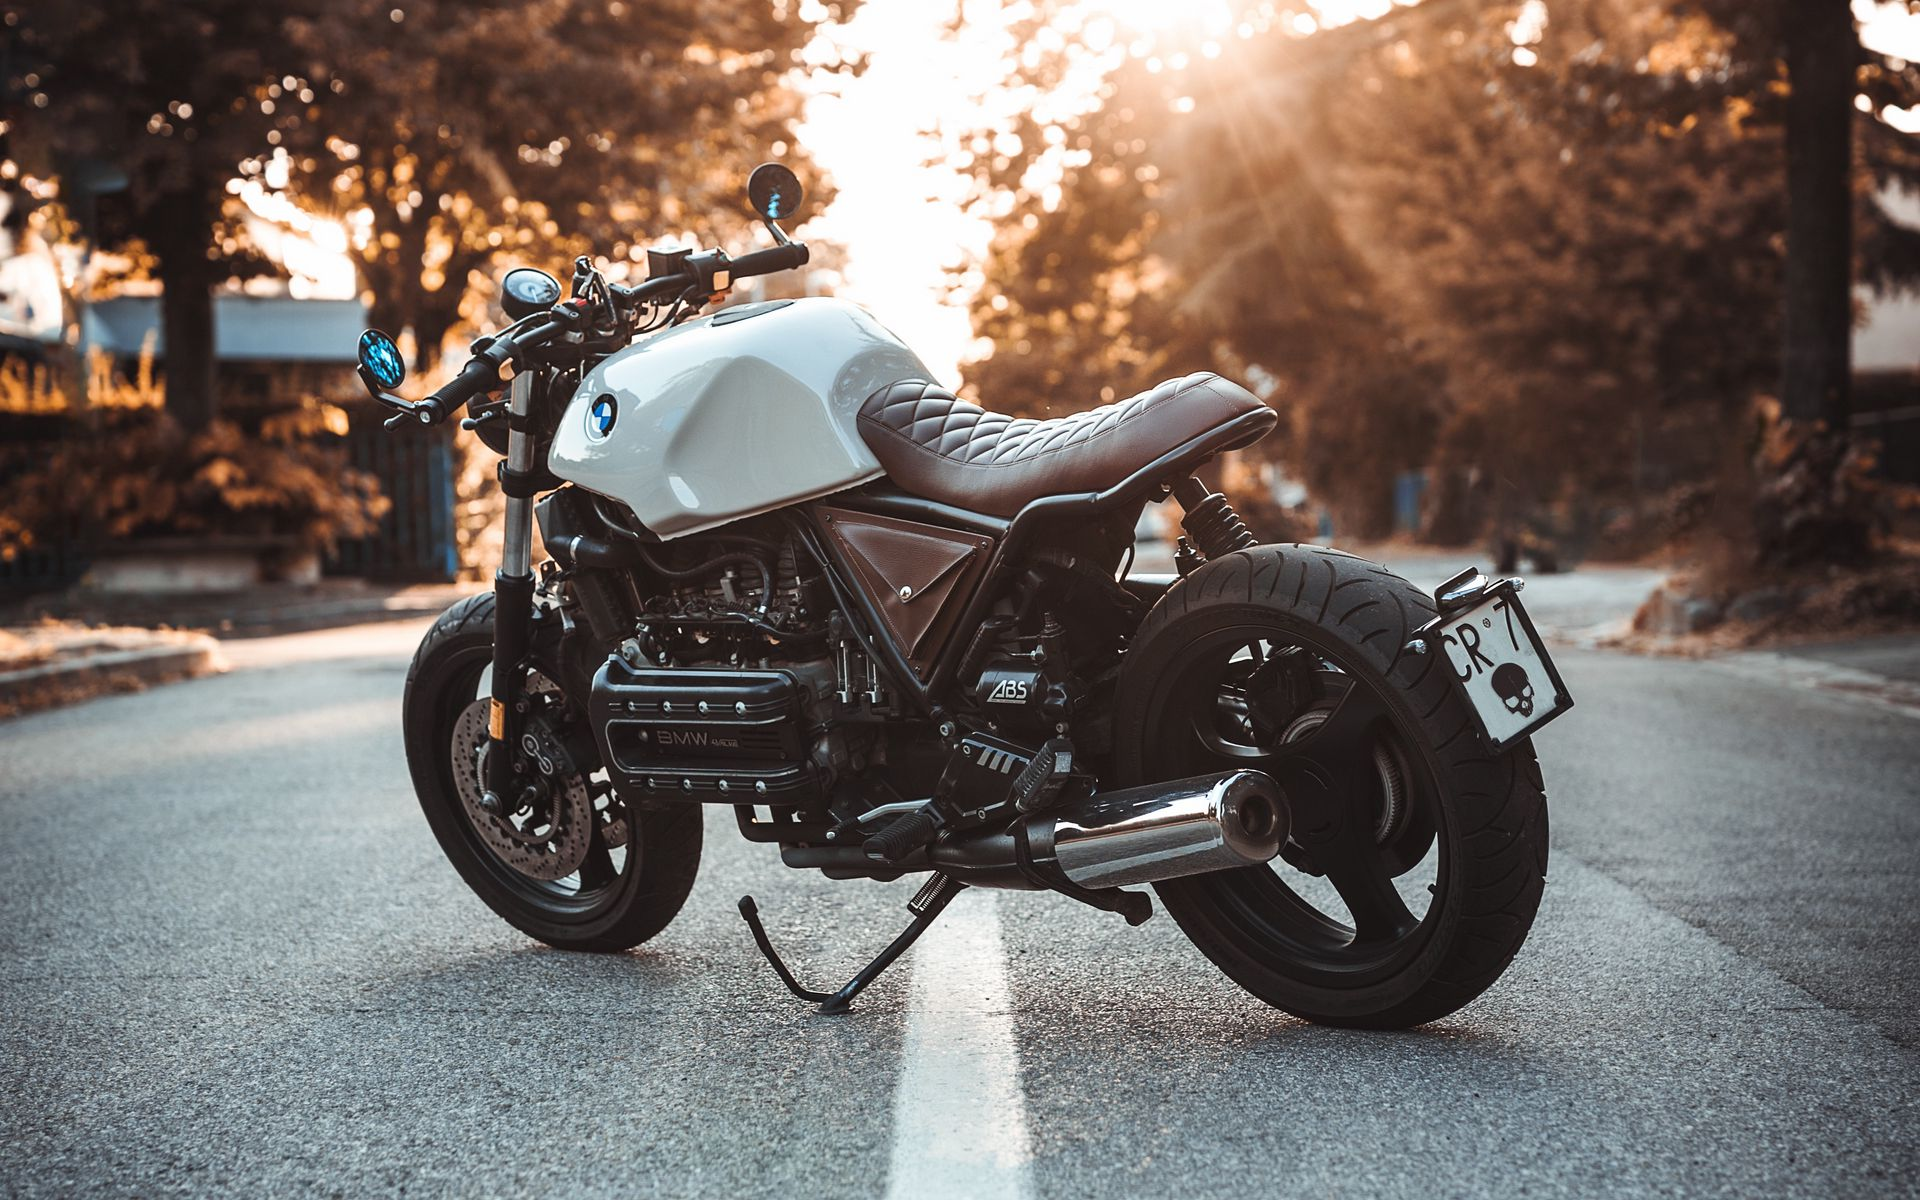 1920x1200 Обои bmw k100, мотоцикл, байк, вид сбоку